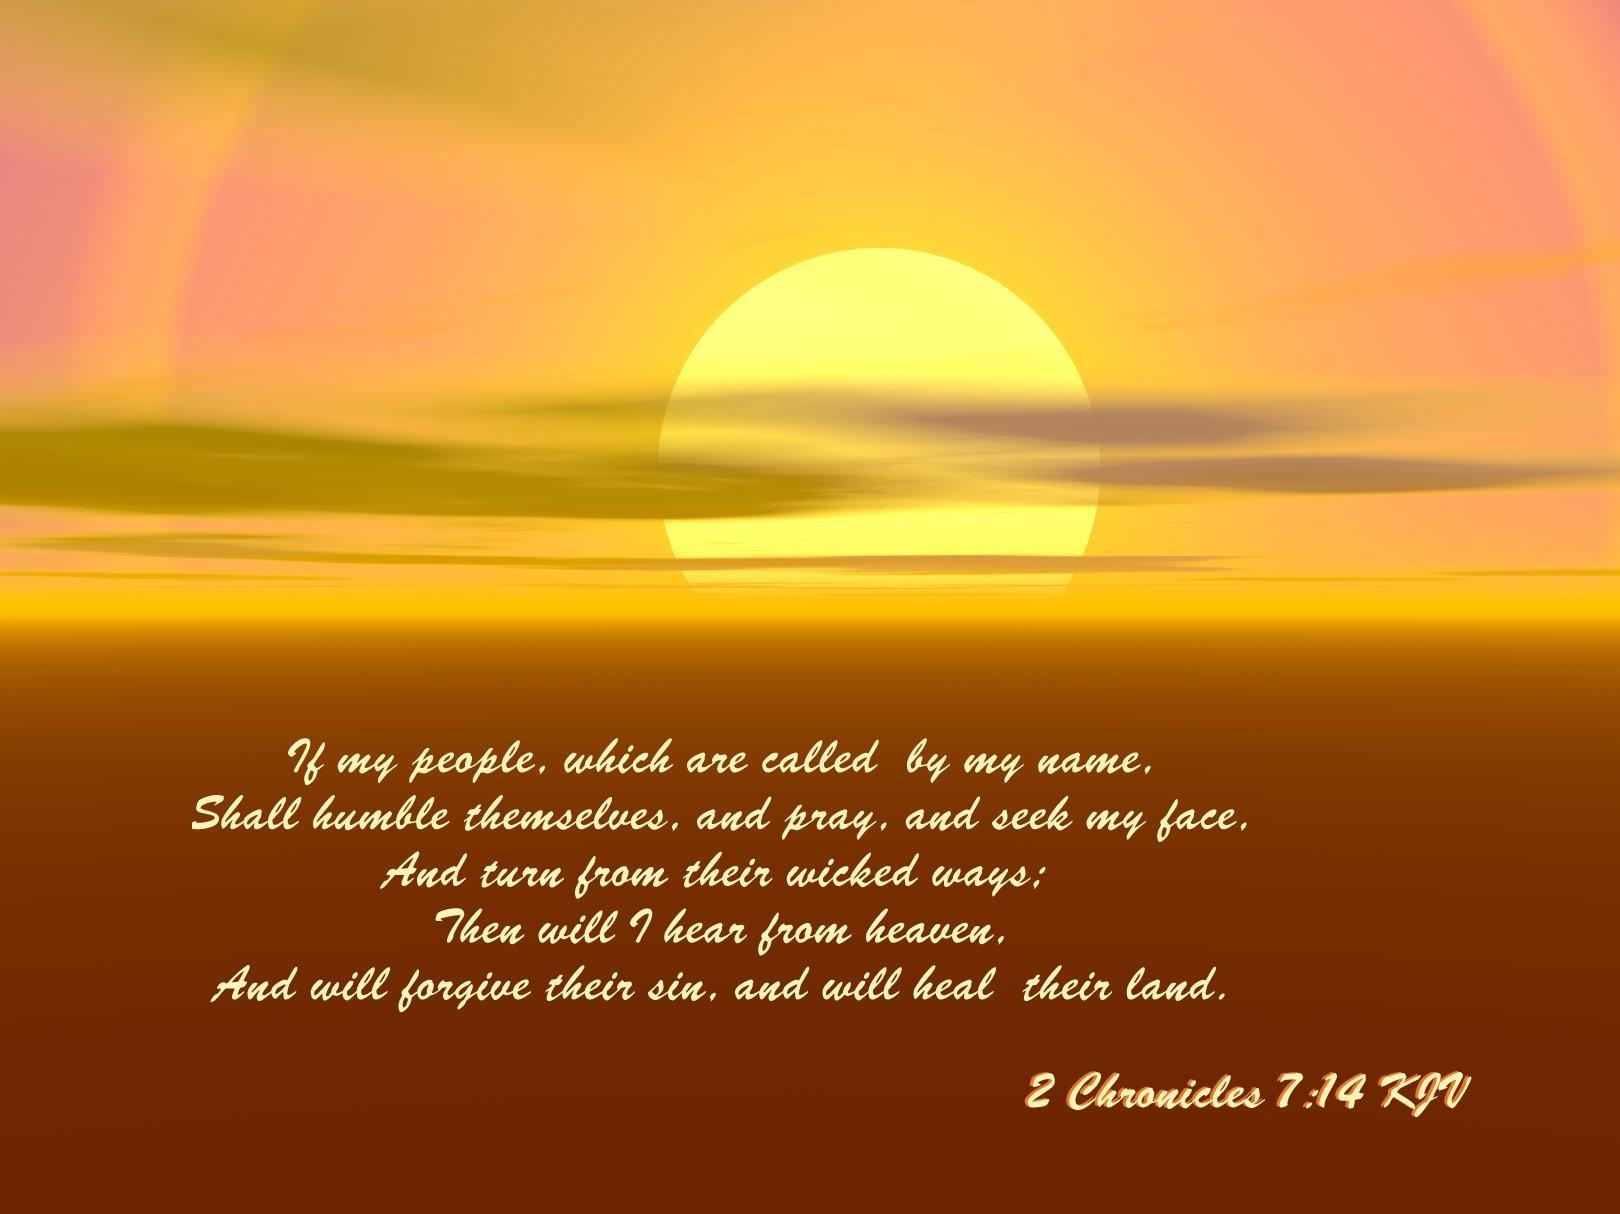 Free Christian Clip Art 2 Chronicles 7 14